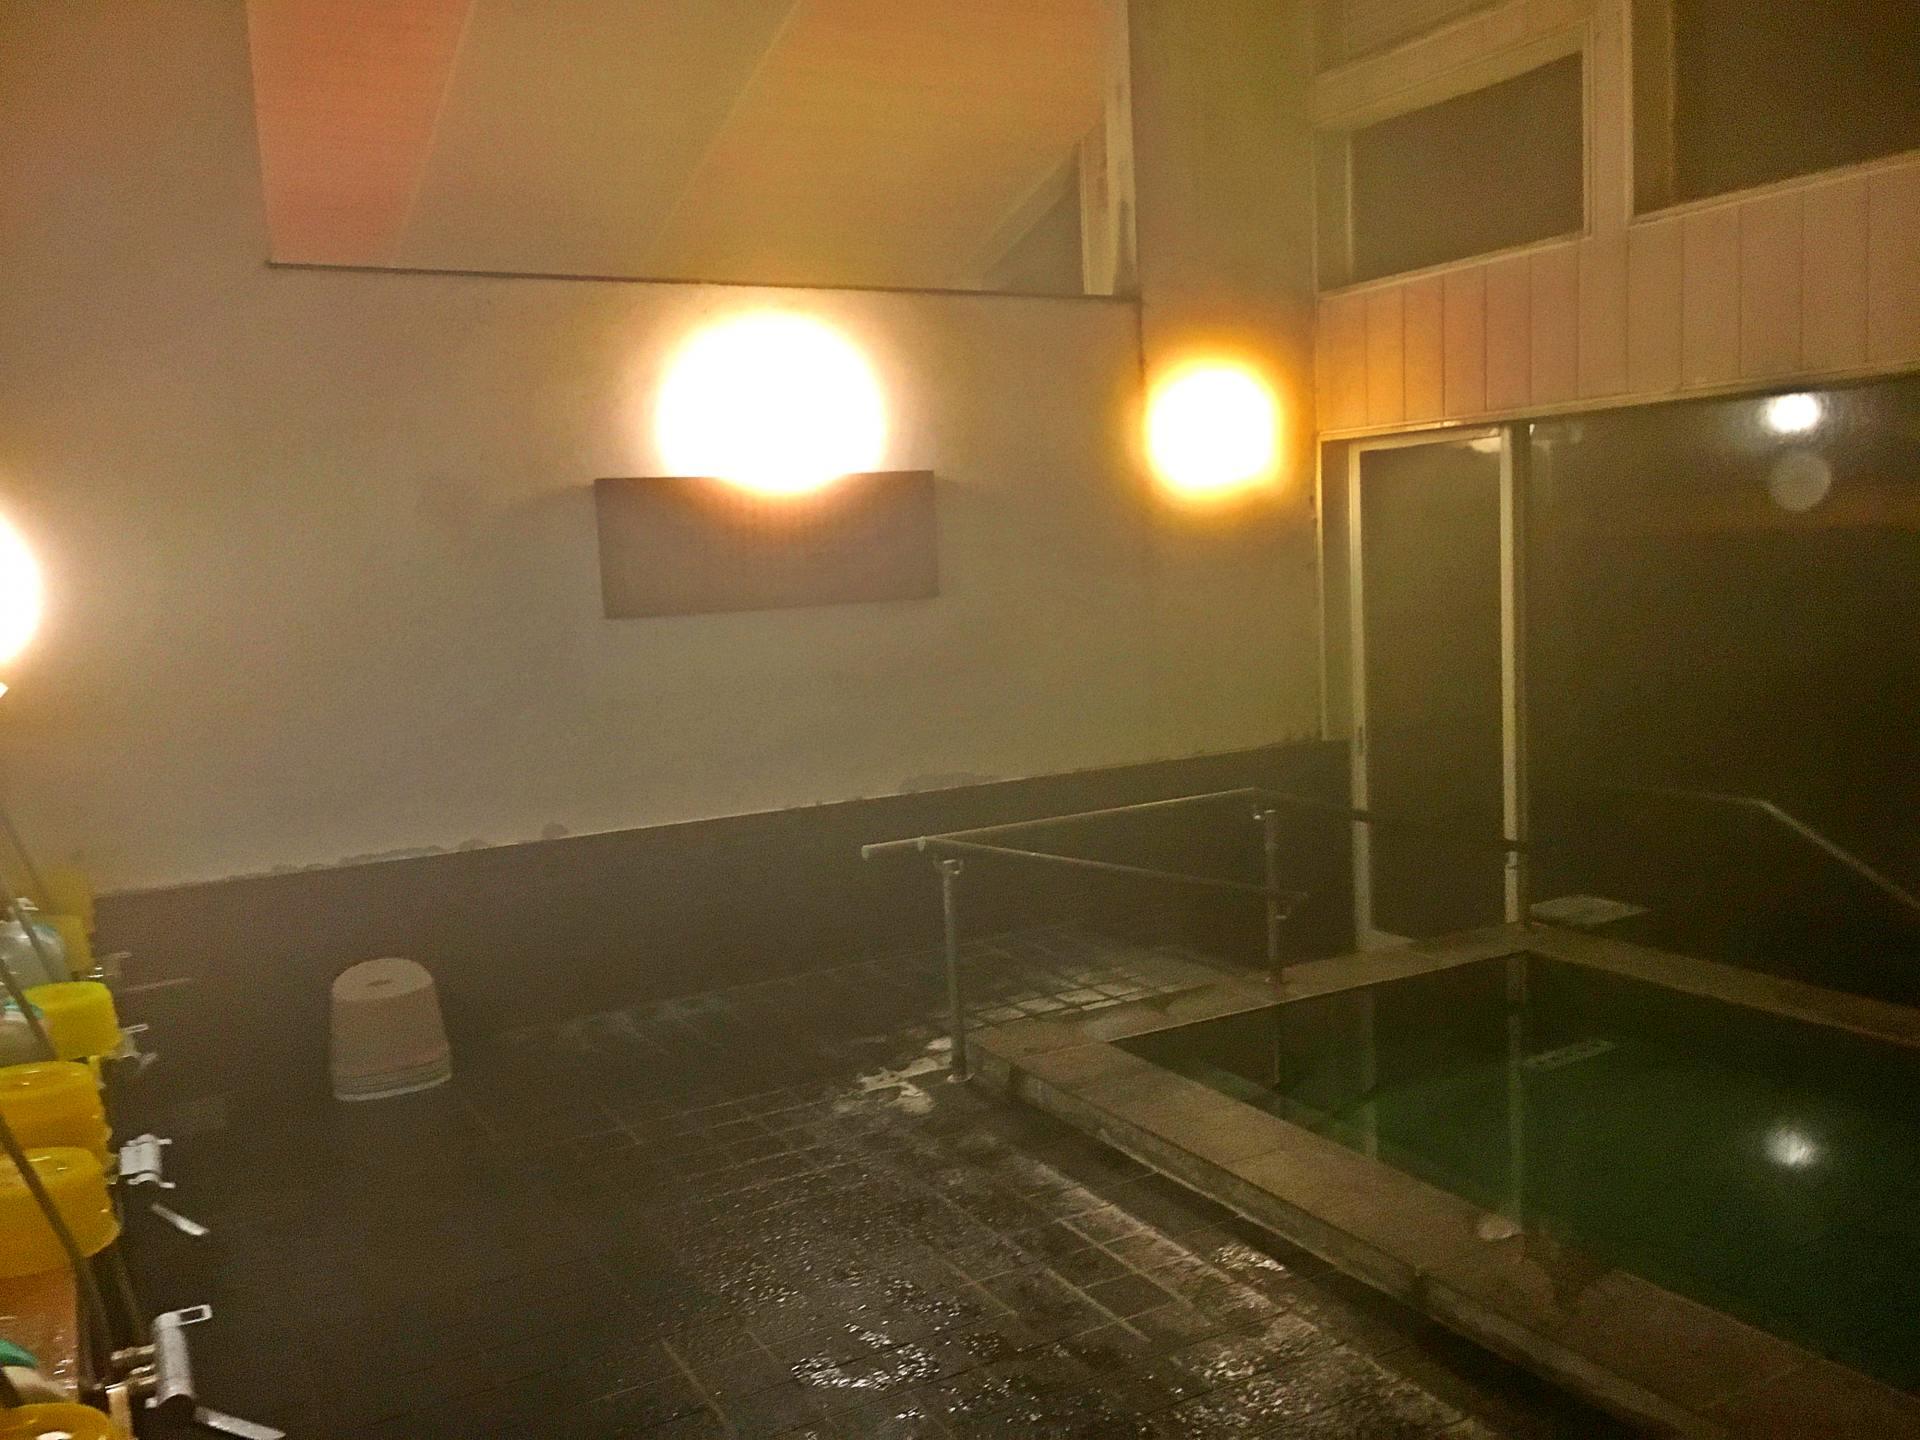 Moderately warm large bath